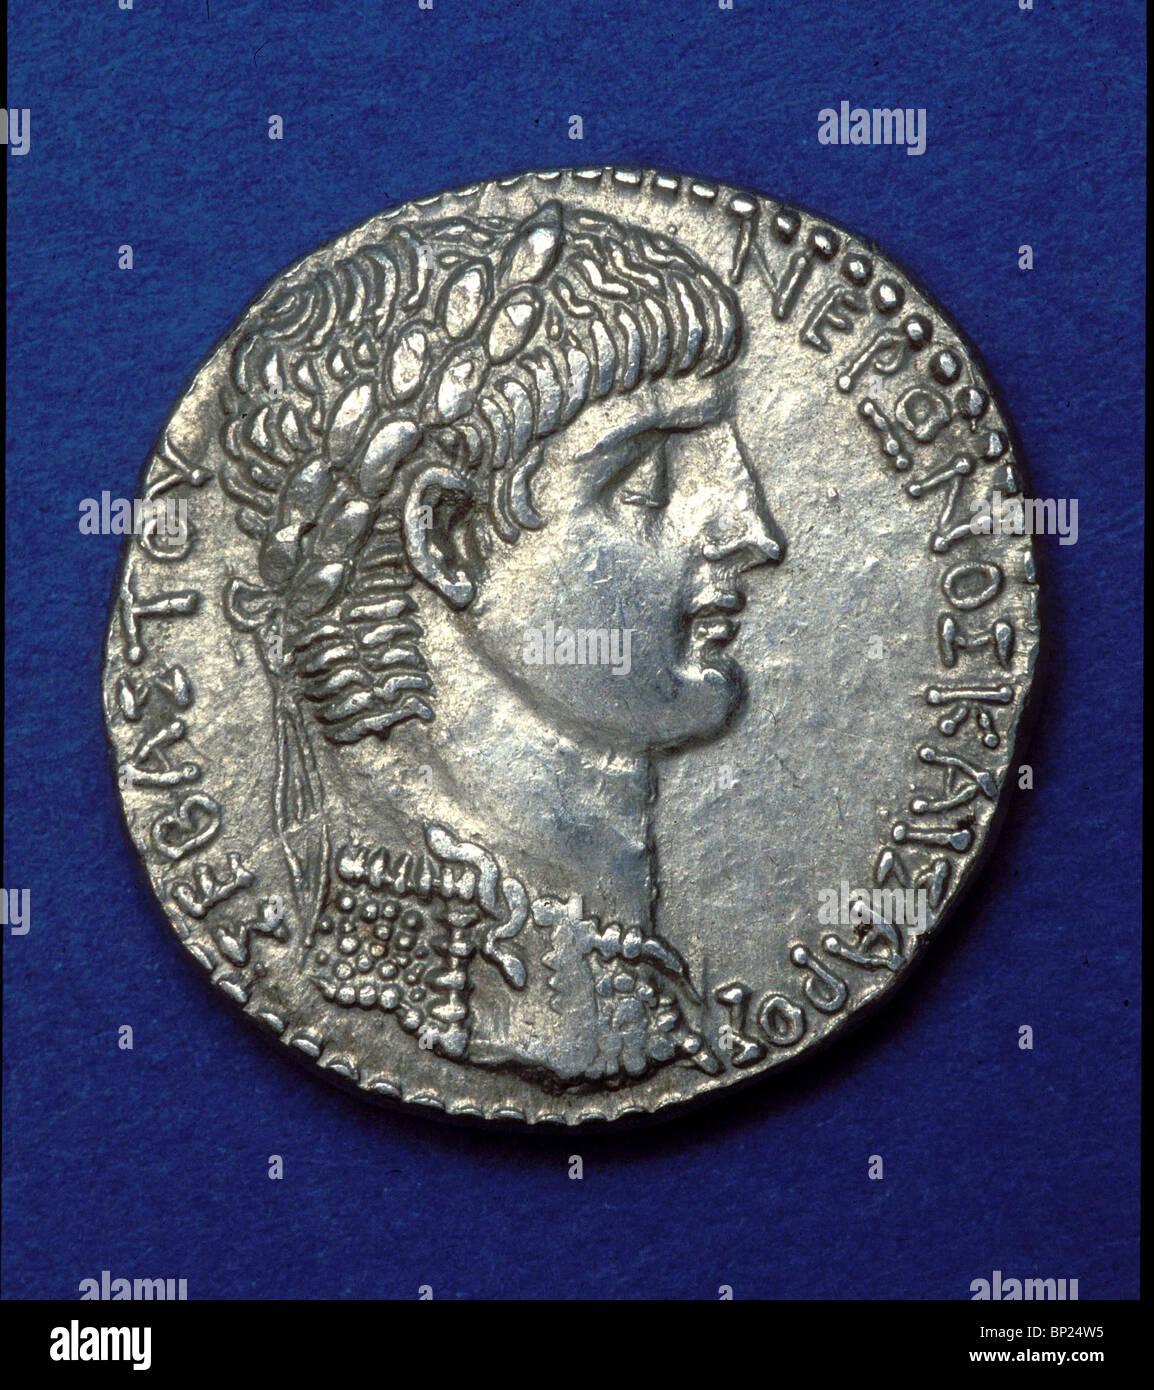 666. ROMAN COIN WITH THE PORTRAIT OF EMPEROR NERO (54 - 68 AD) - Stock Image